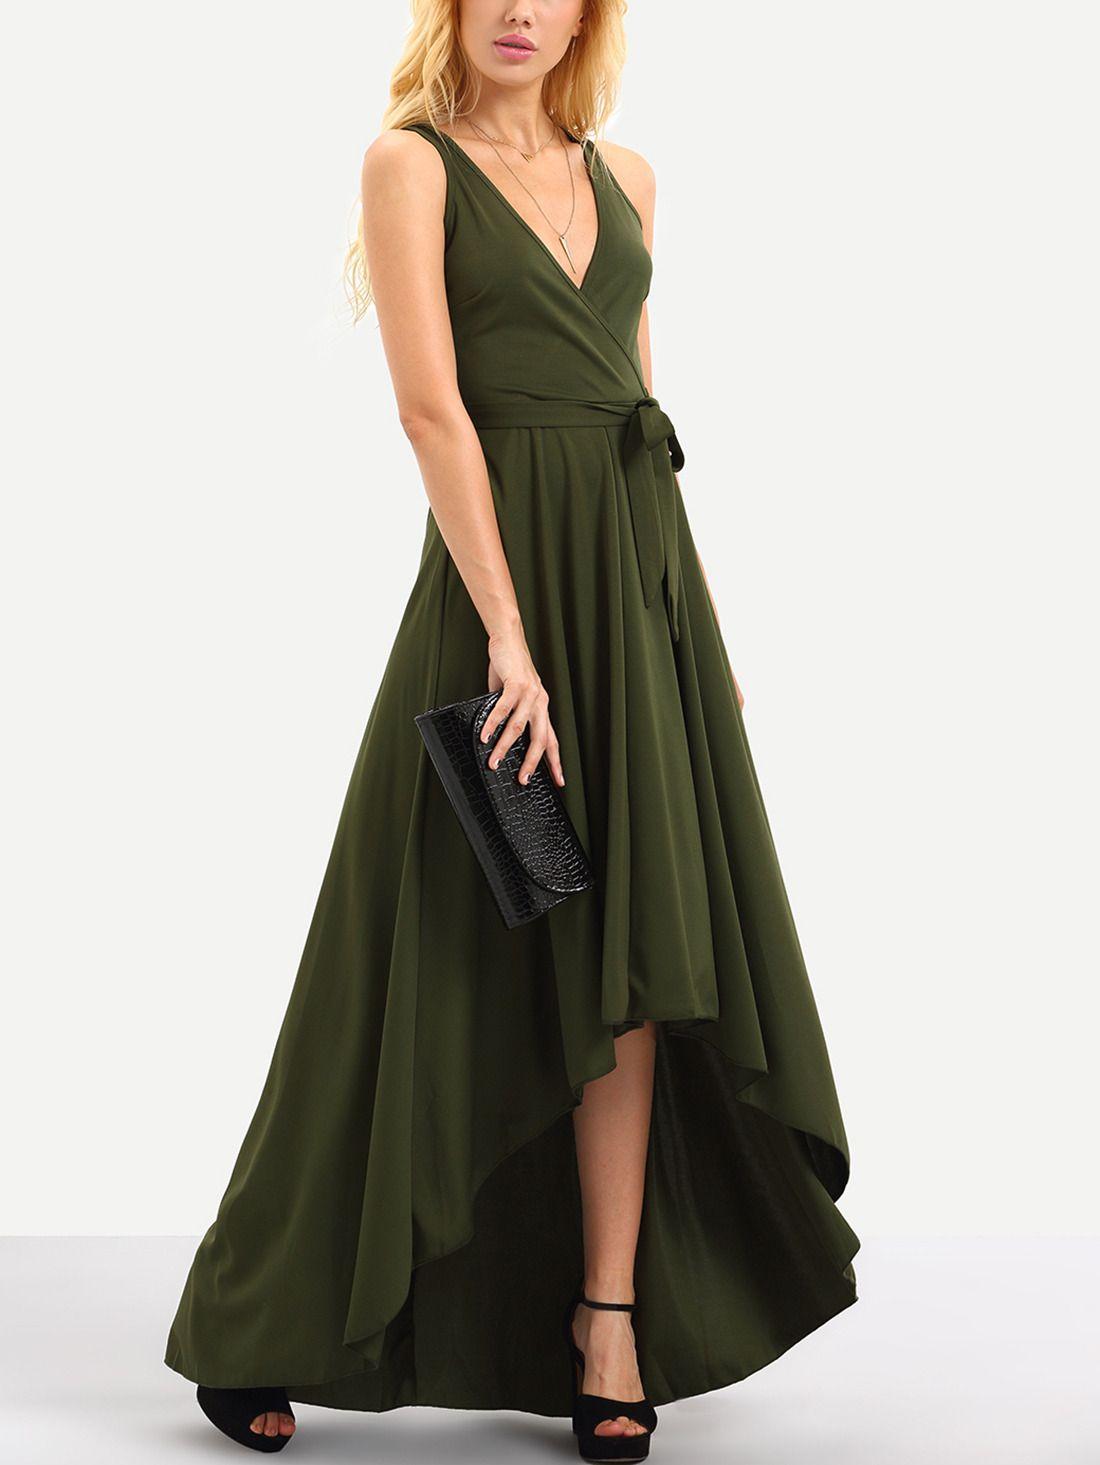 Park Art My WordPress Blog_Olive Green Maxi Dress With Pockets